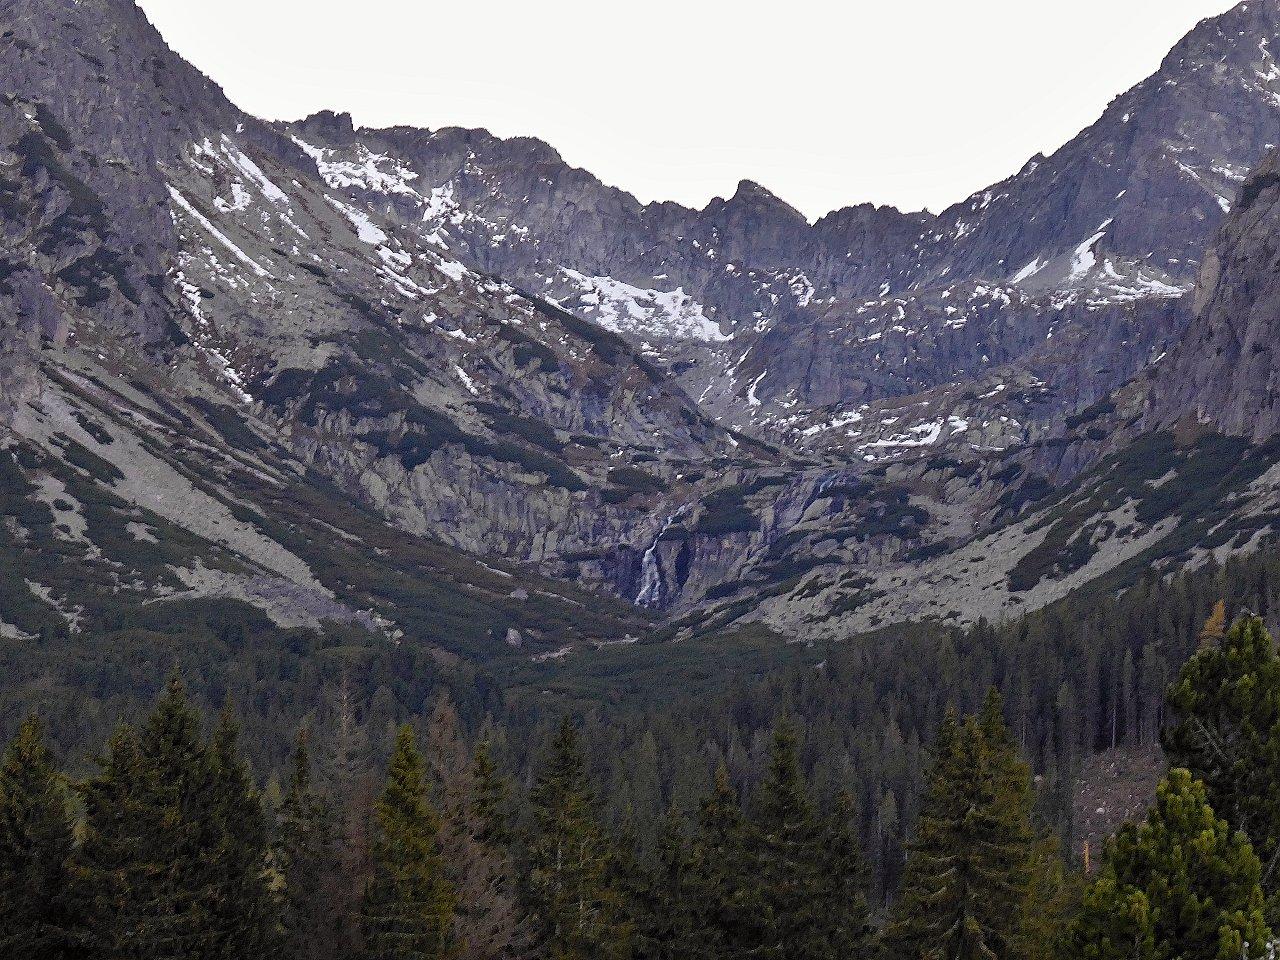 Skok waterfall and surrounding peaks of Tatra Mountains, Slovakia